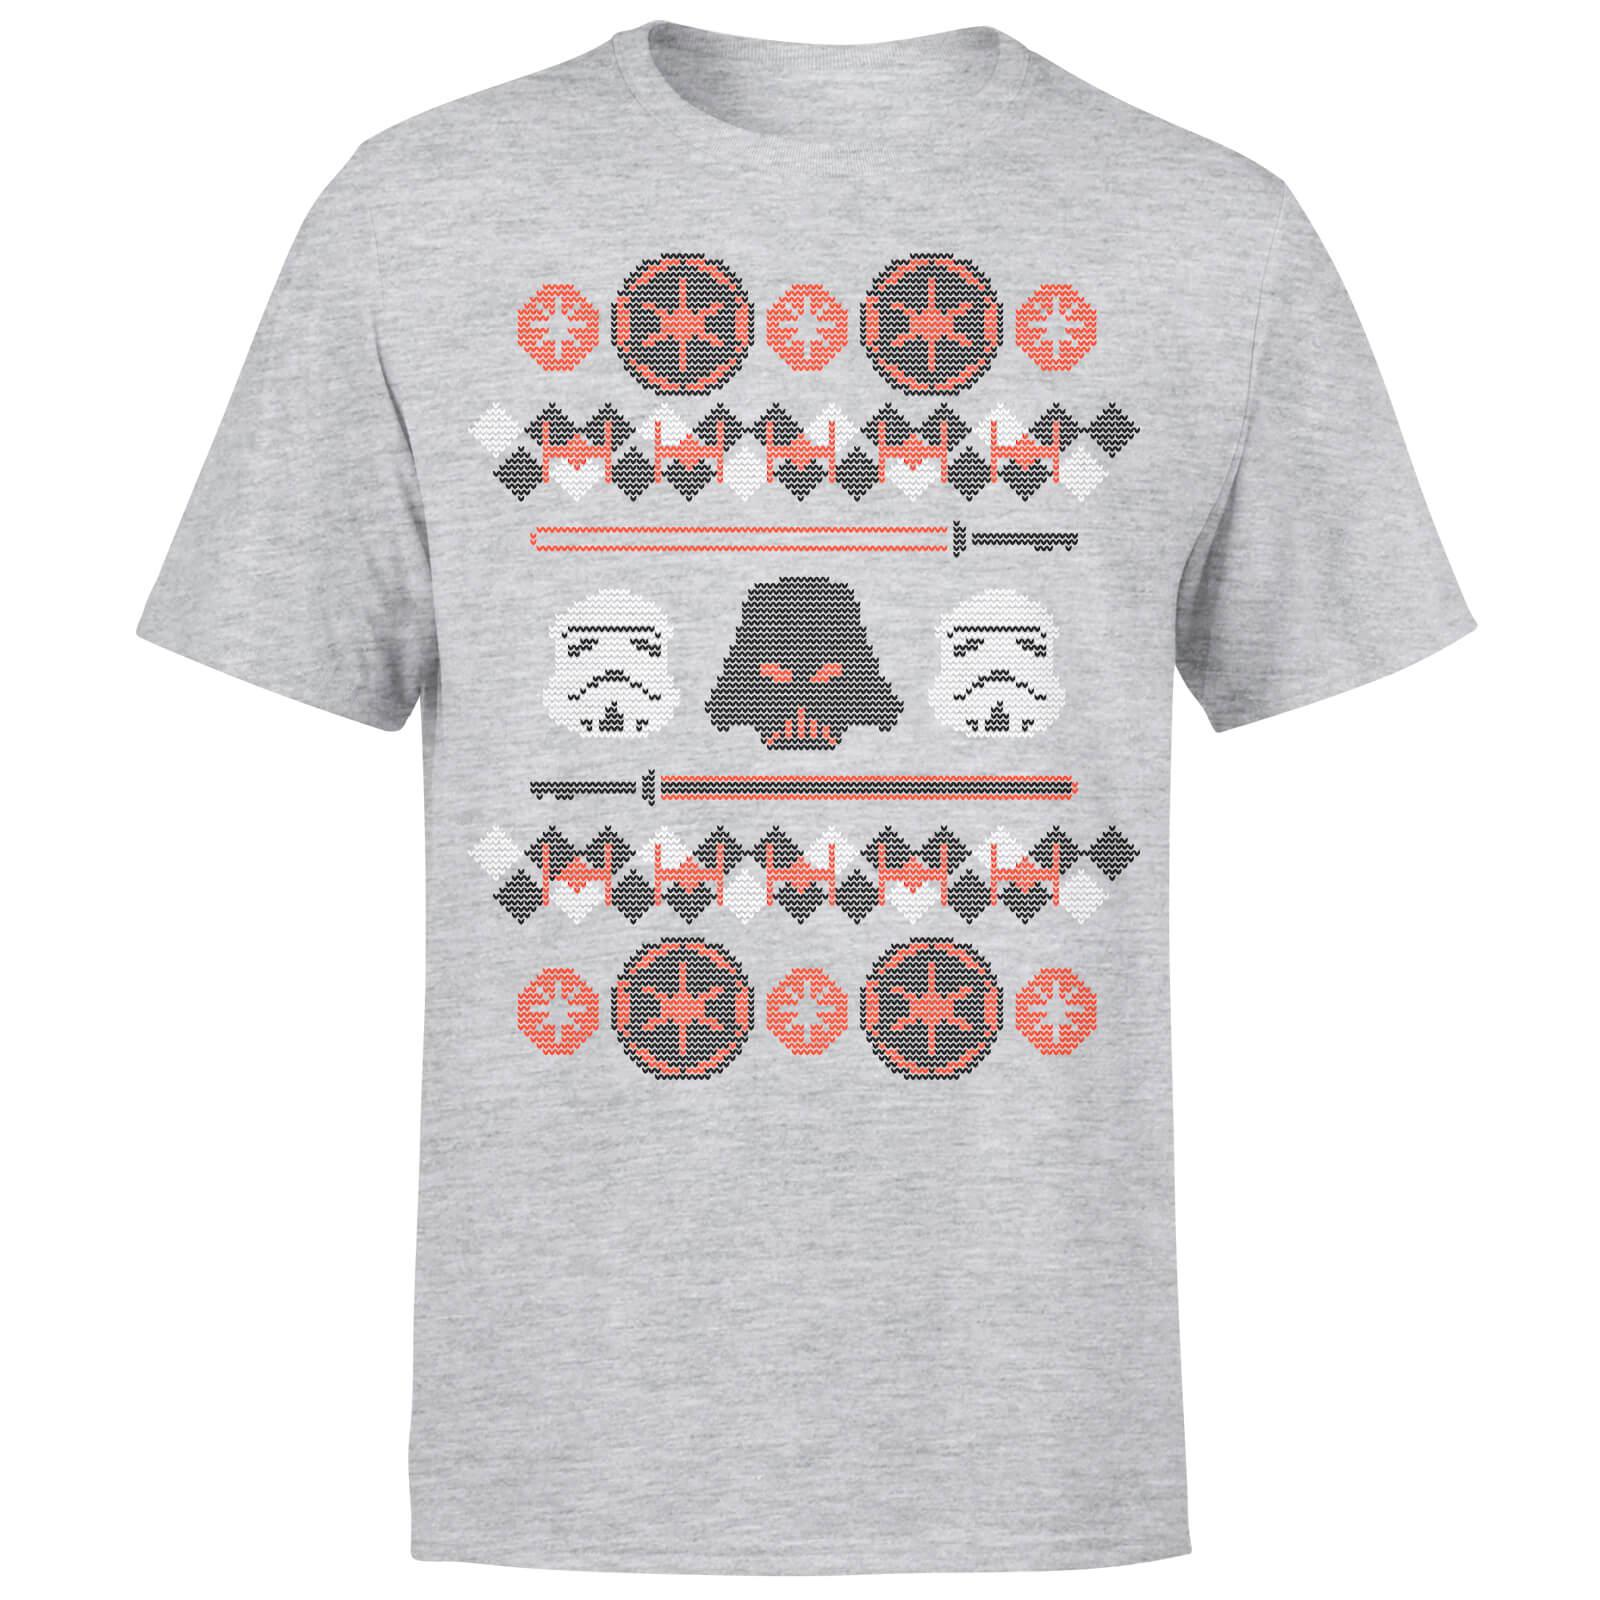 Star Wars T-Shirt Homme Sucre d'Orge Yoda Star Wars - Noir - M - Gris